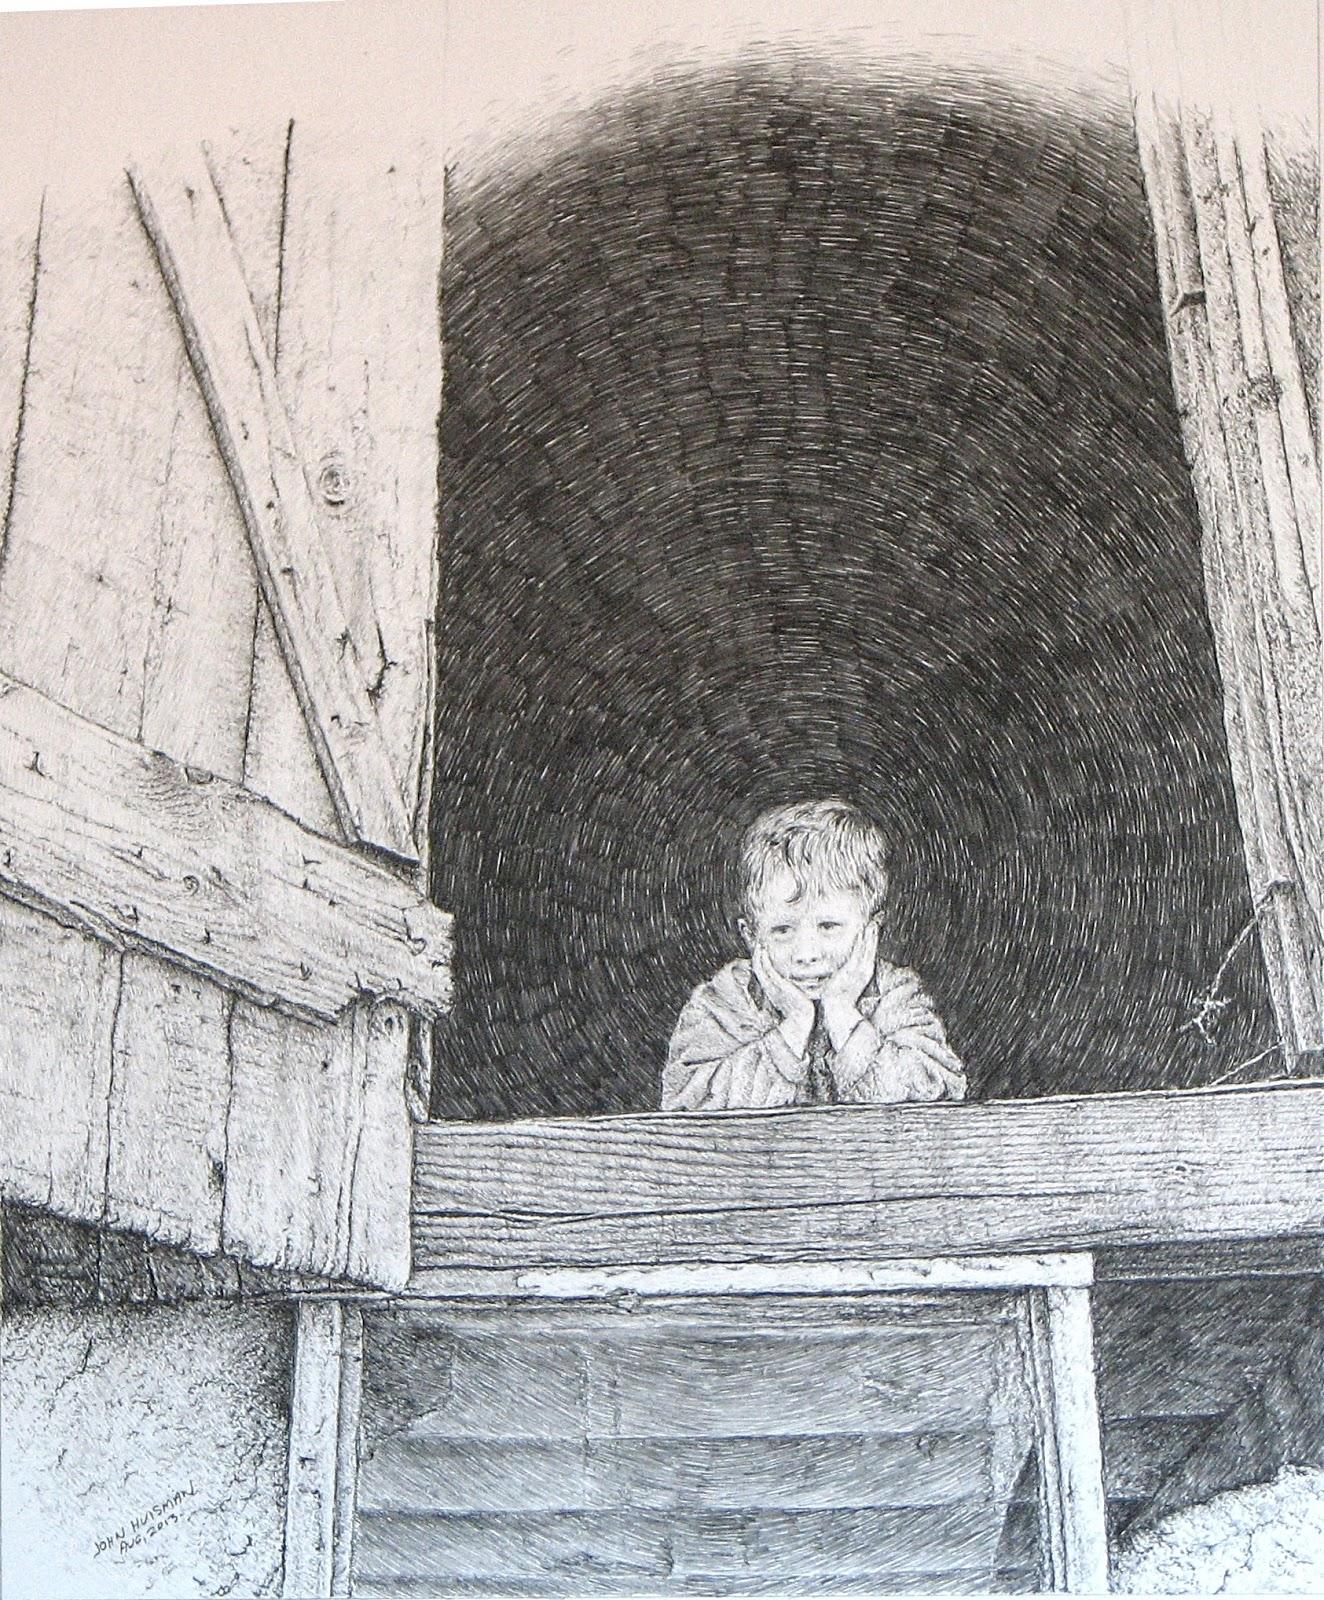 An Old Barn Pencil On Ristol Board By John Huisman